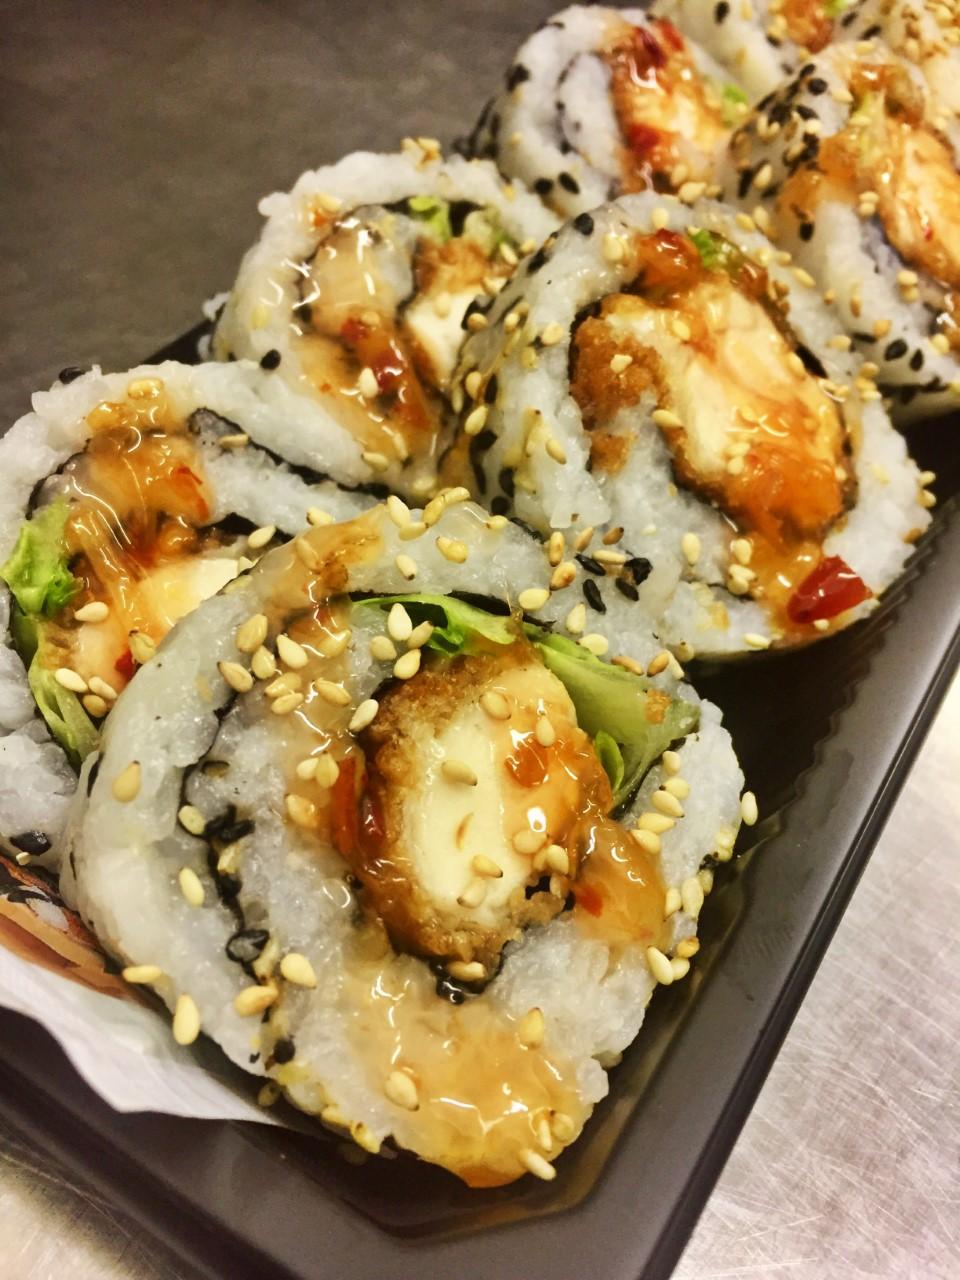 Chicken Katsu Roll with Sweet Chili - £6